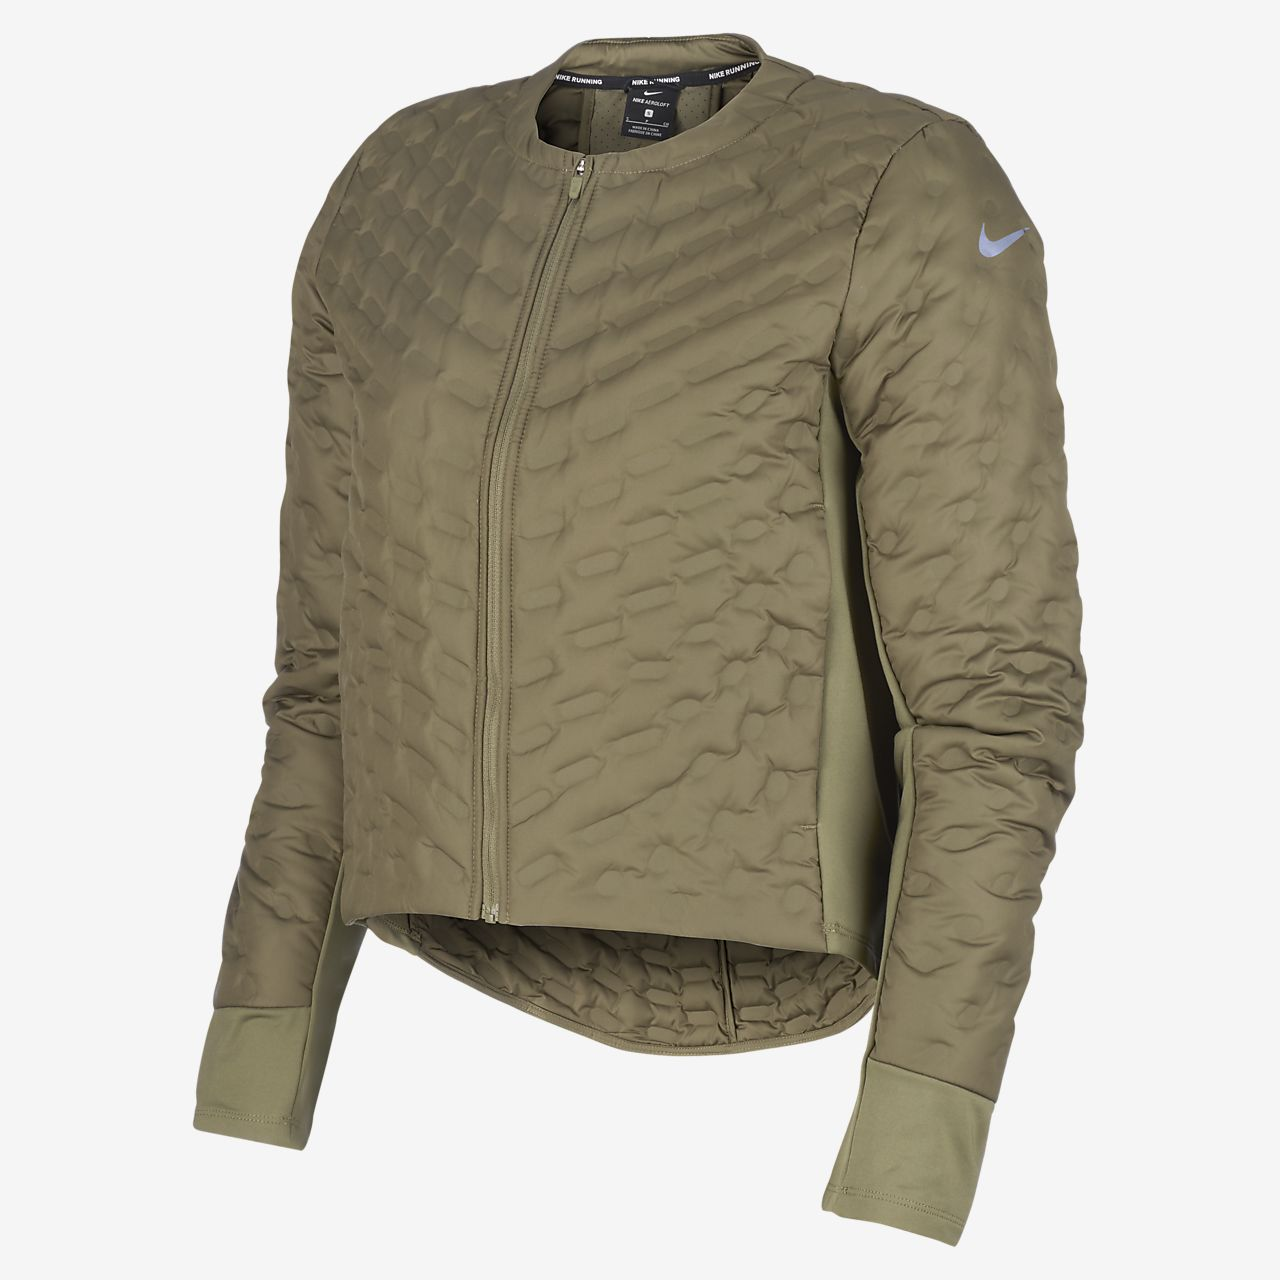 1cb2eba7ba37 Nike AeroLoft Women s Running Jacket. Nike.com NL